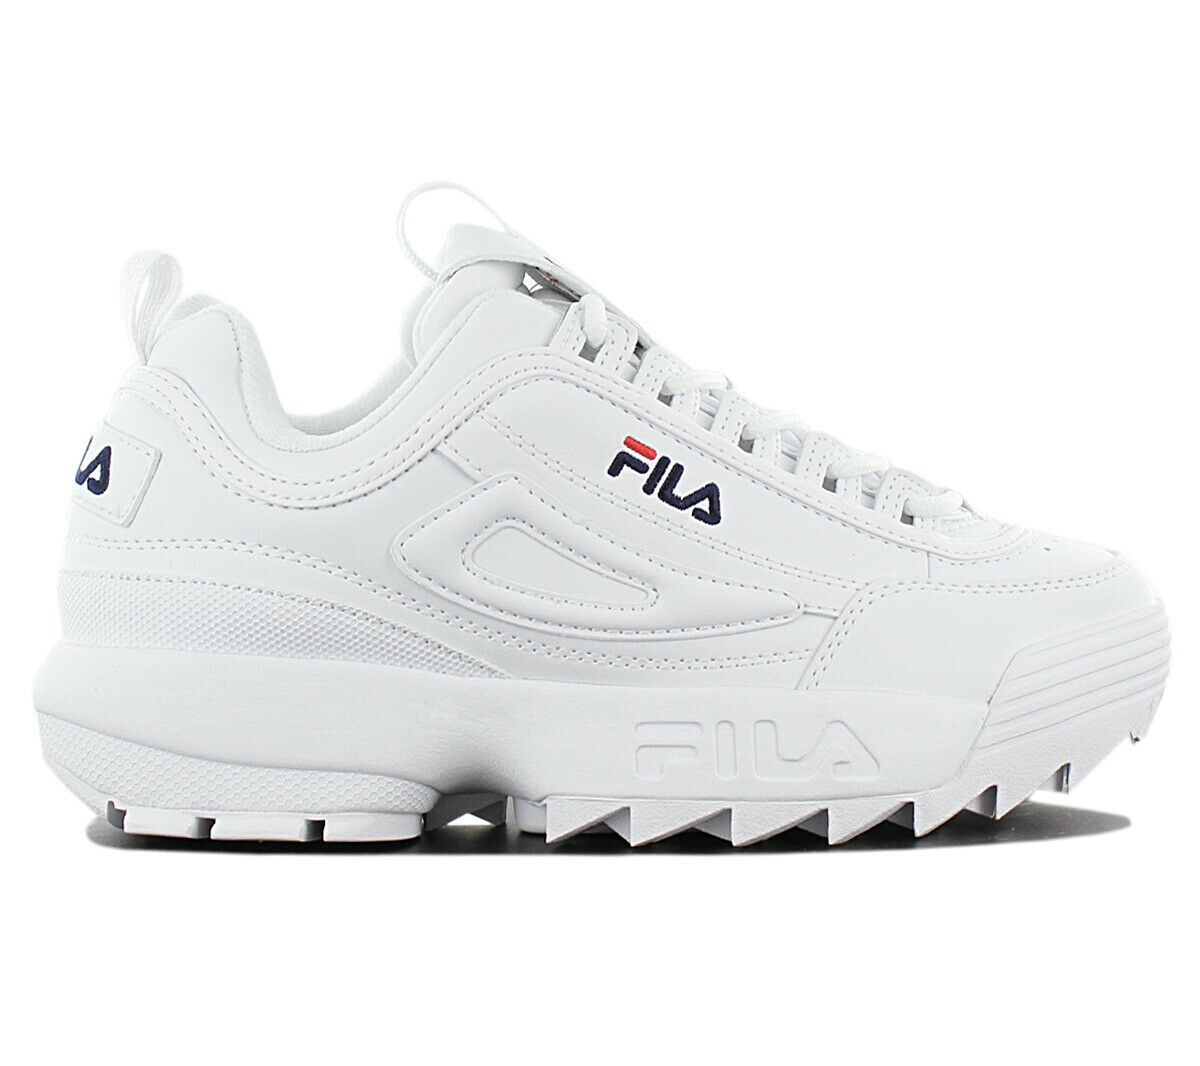 Fila Disruptor Low W Women's Sneaker Shoes 1010302.1FG White Casual Trainers